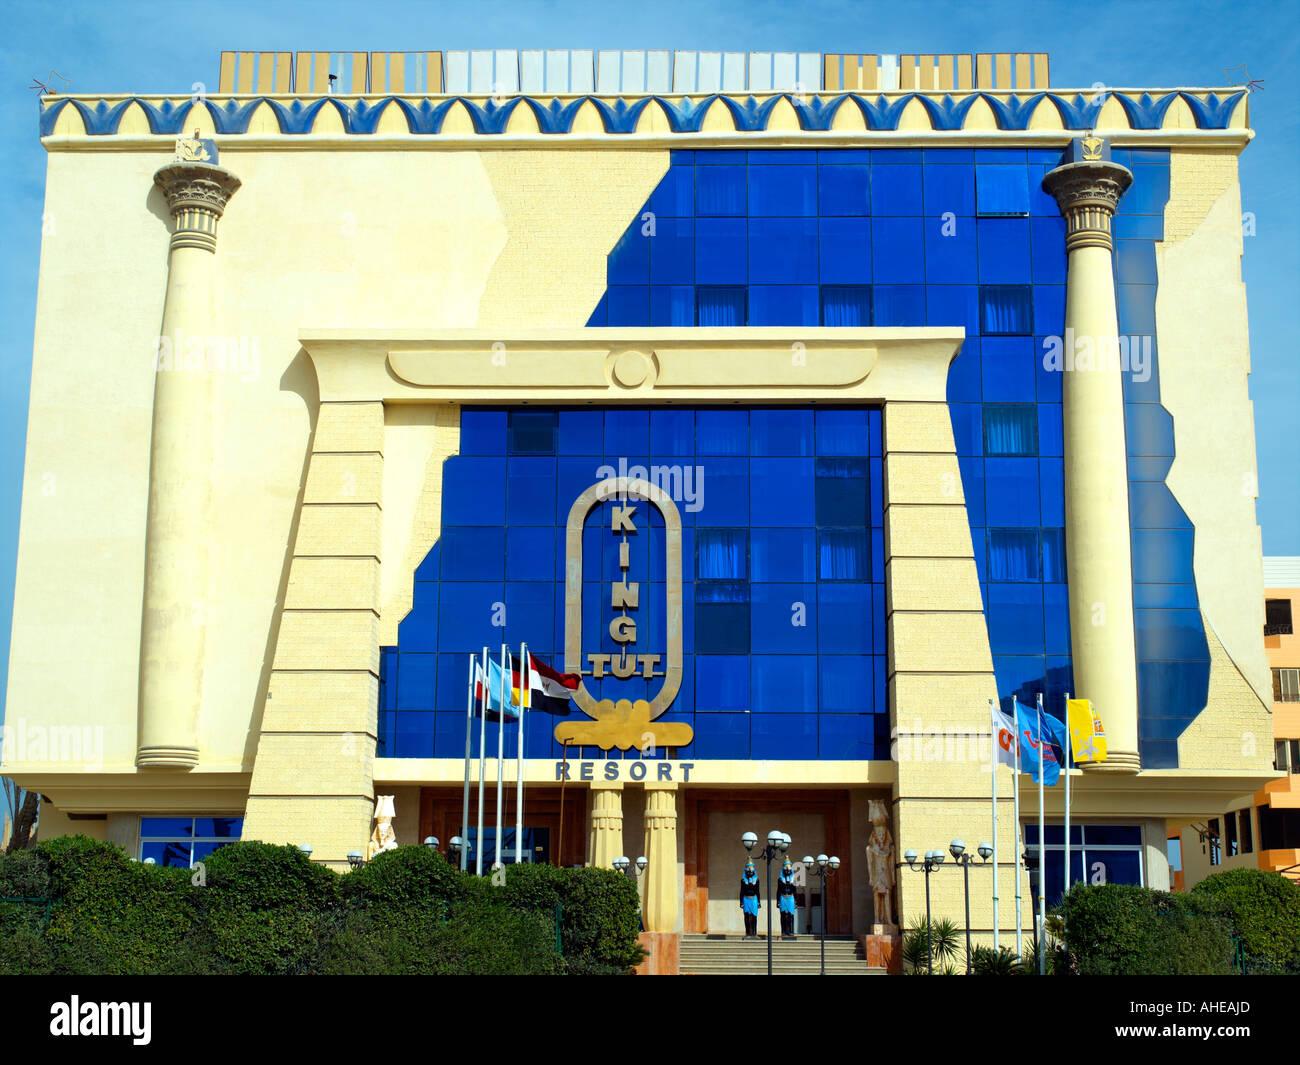 The 'King Tut' resort Hotel in Hurghada - Stock Image